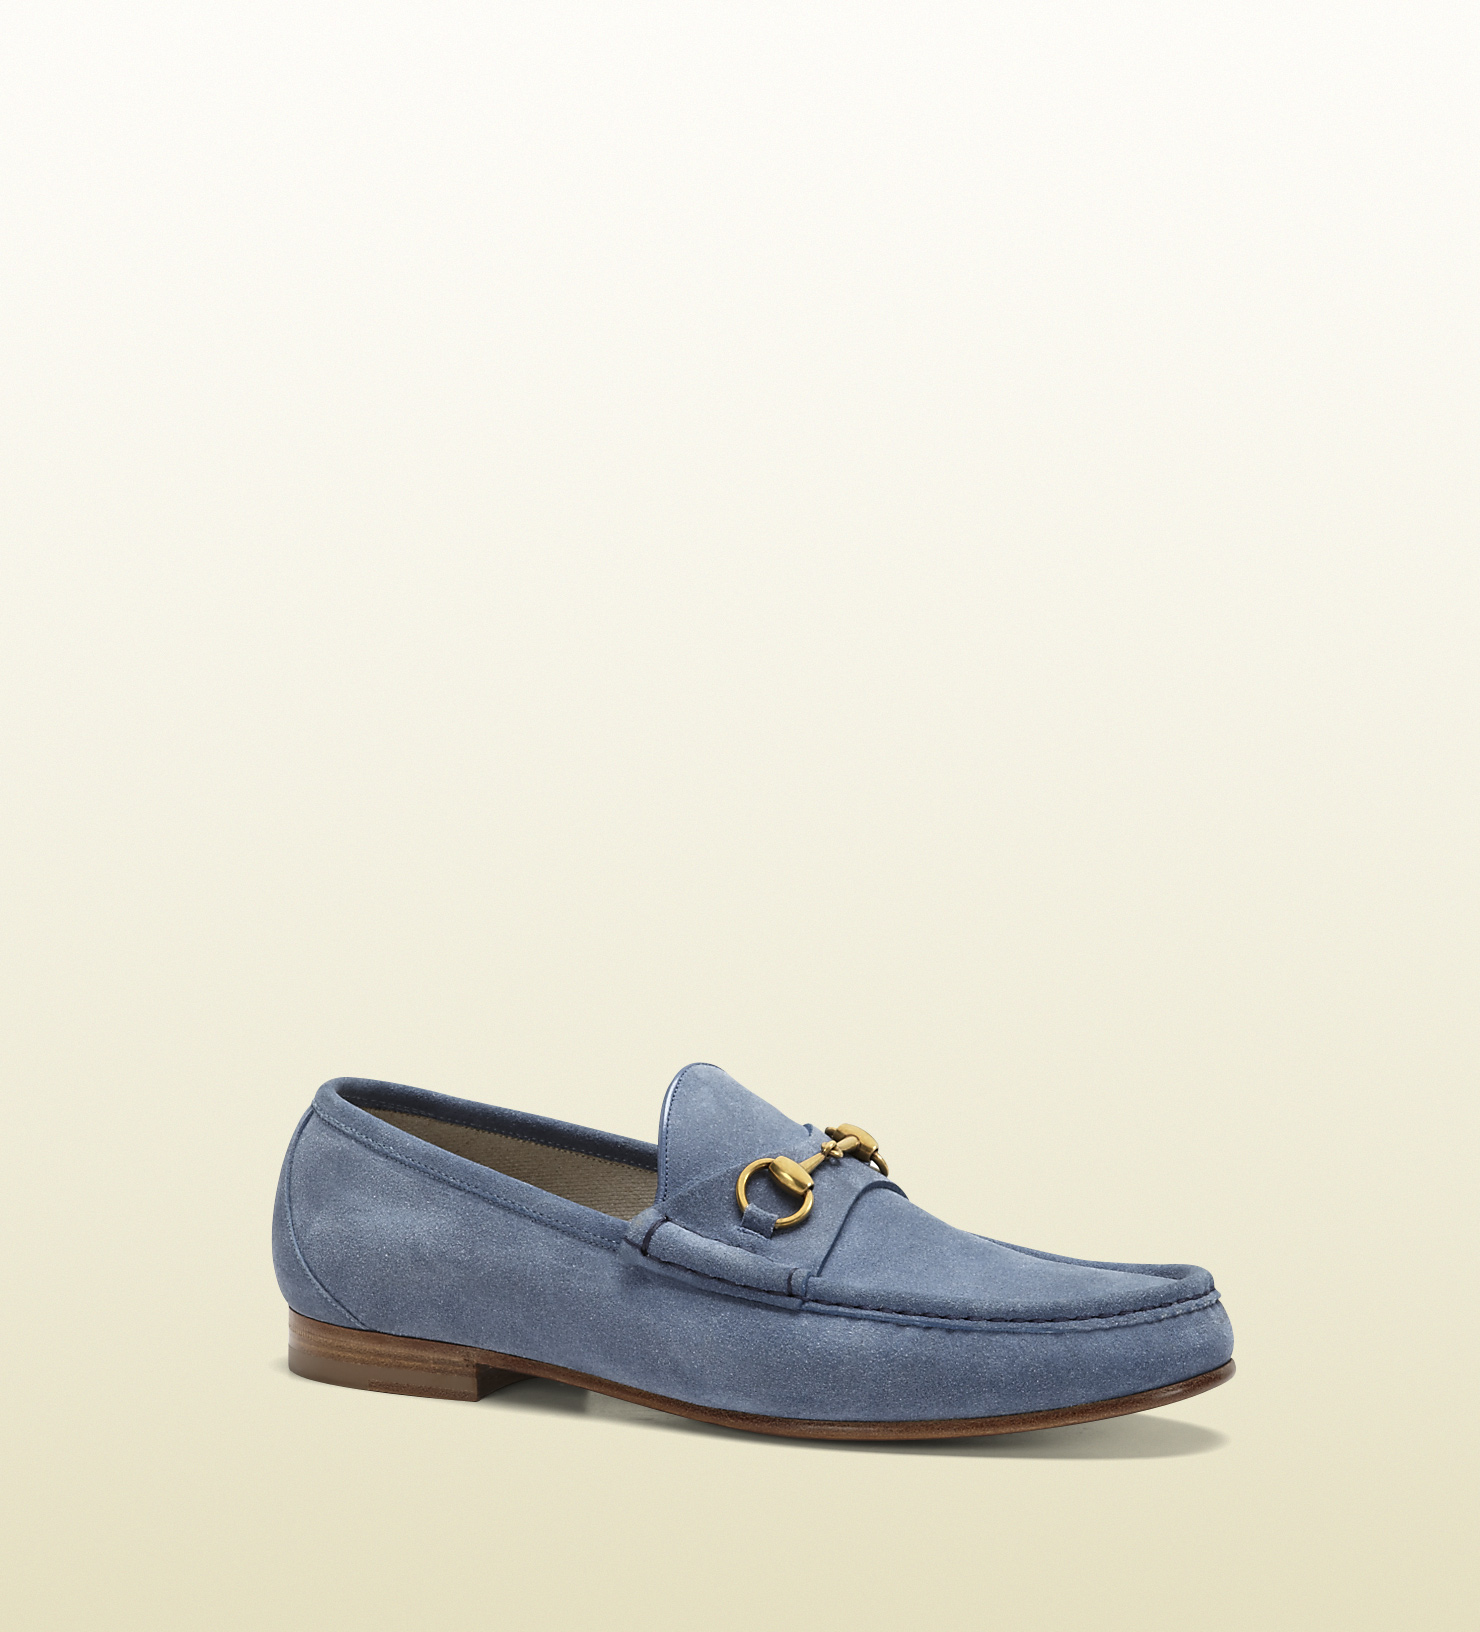 652466546 Gucci 1953 Horsebit Loafer In Suede in Blue for Men - Lyst